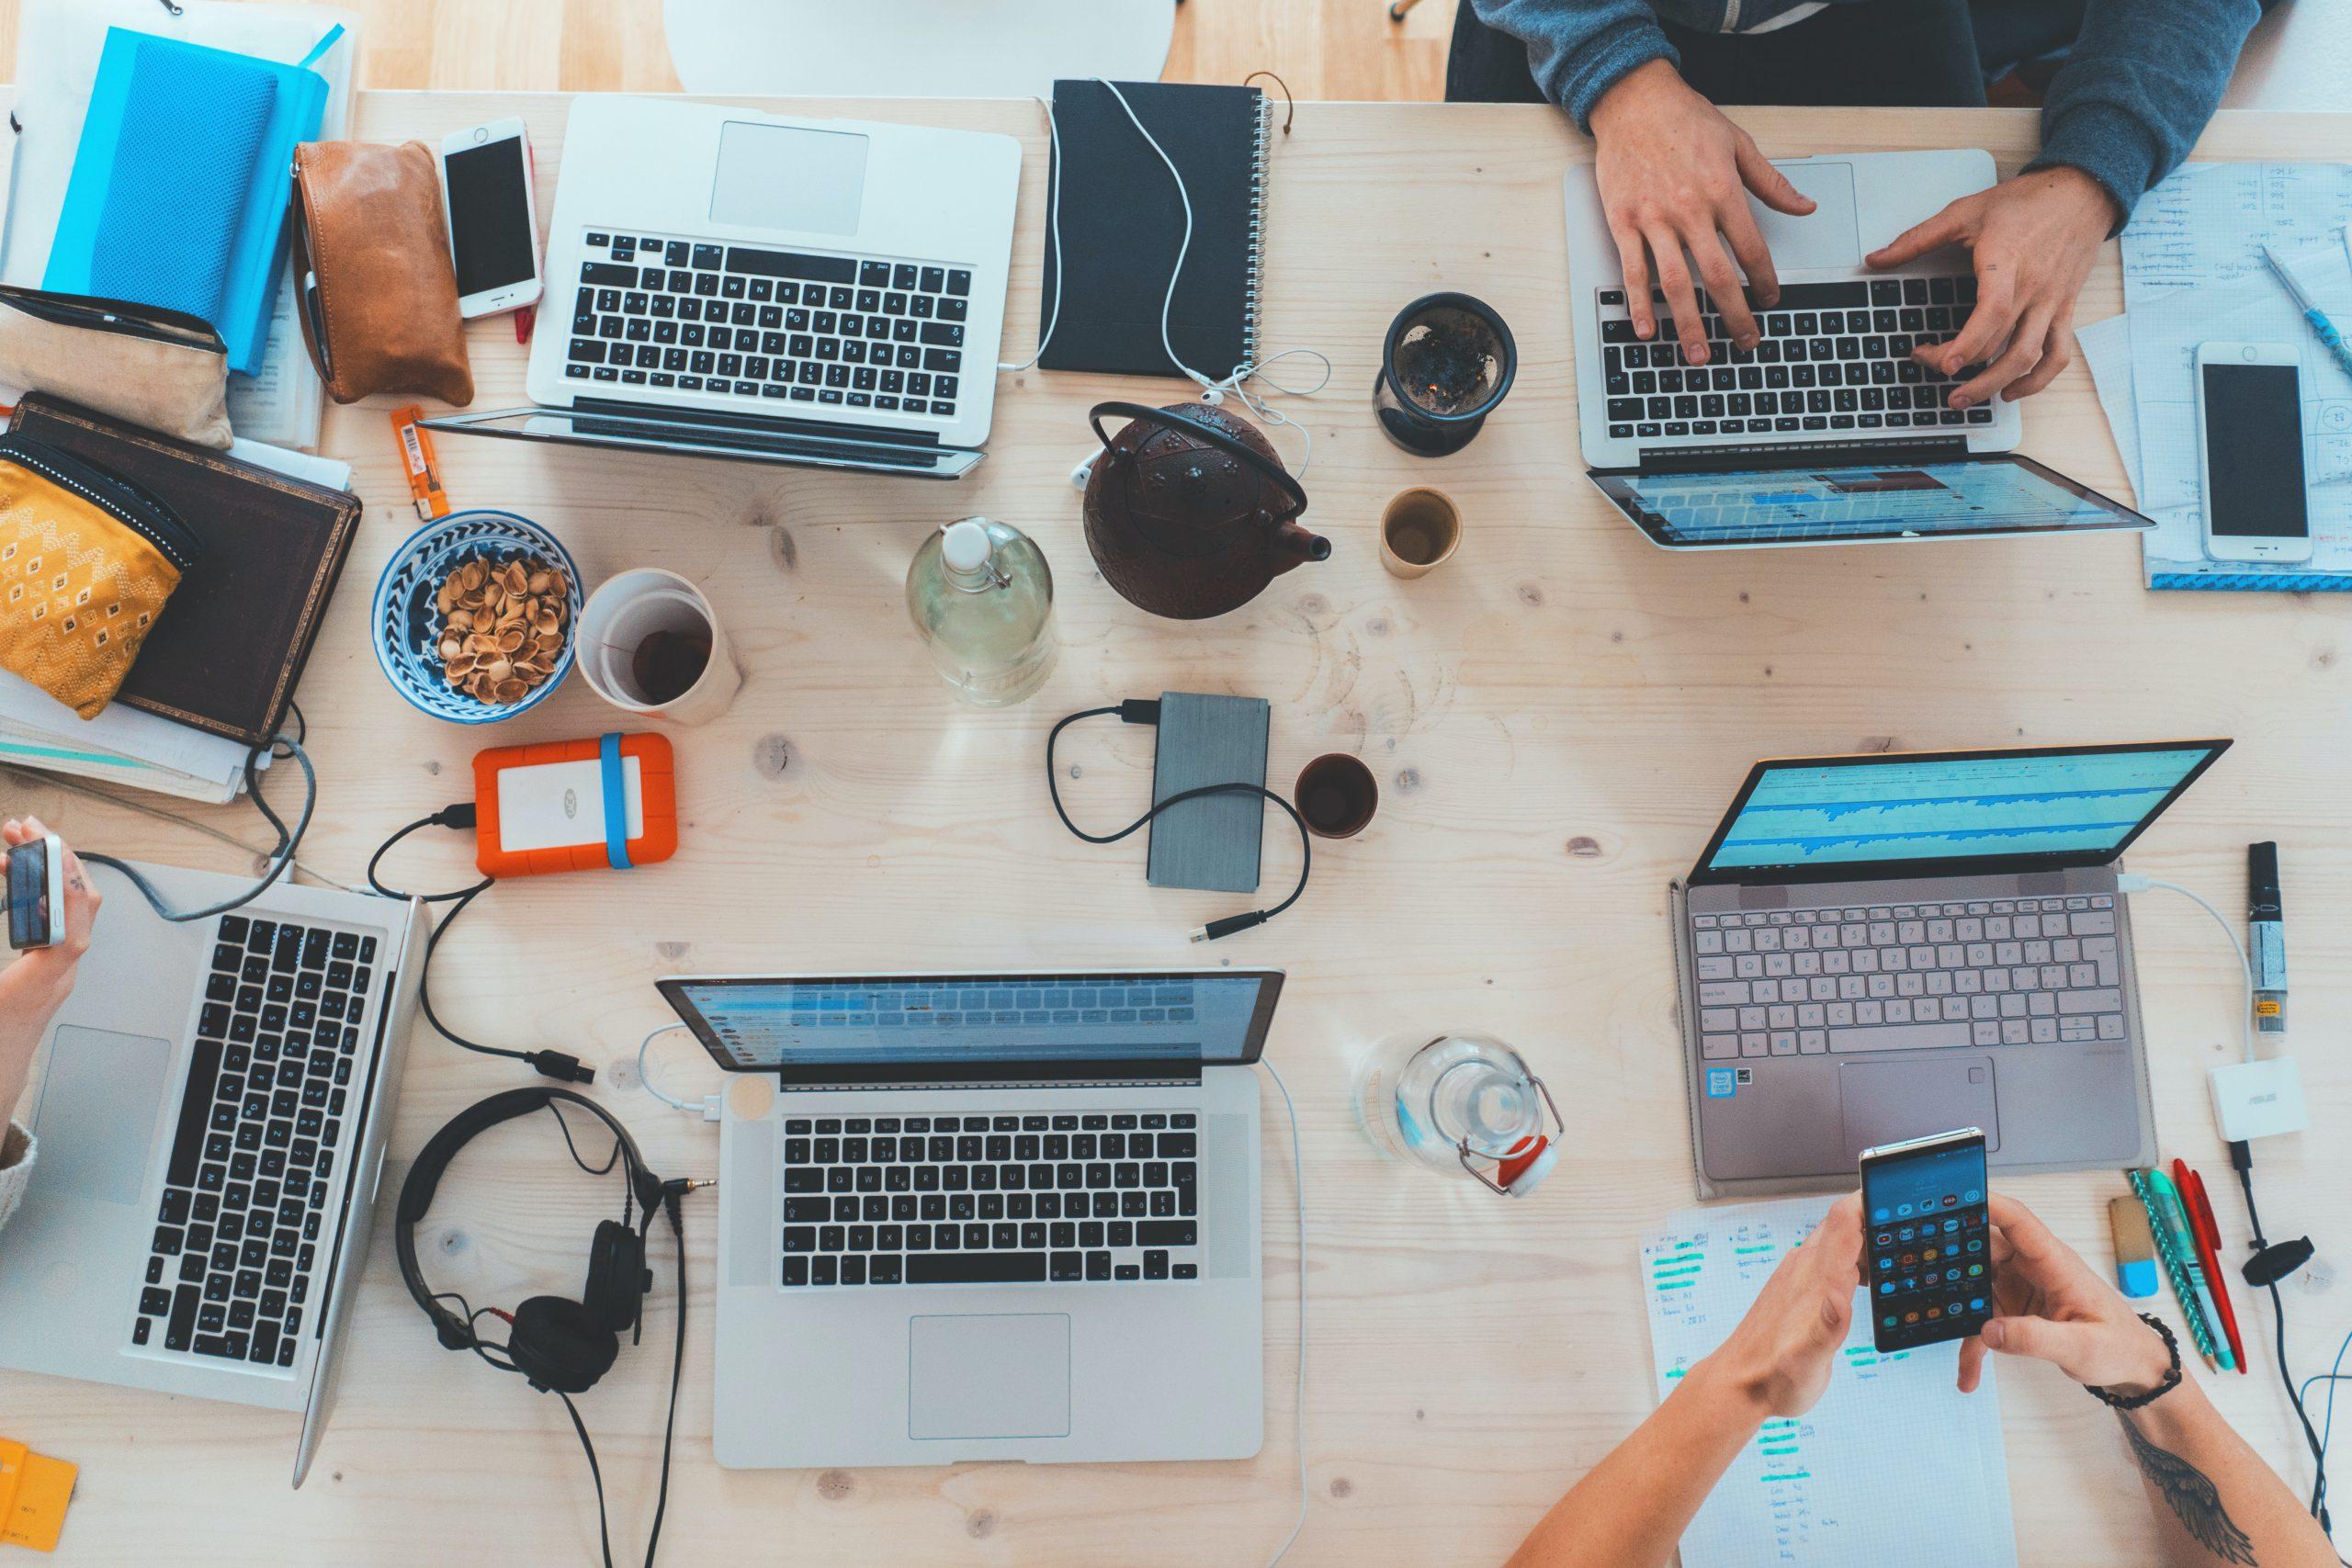 Managing Macs remotely